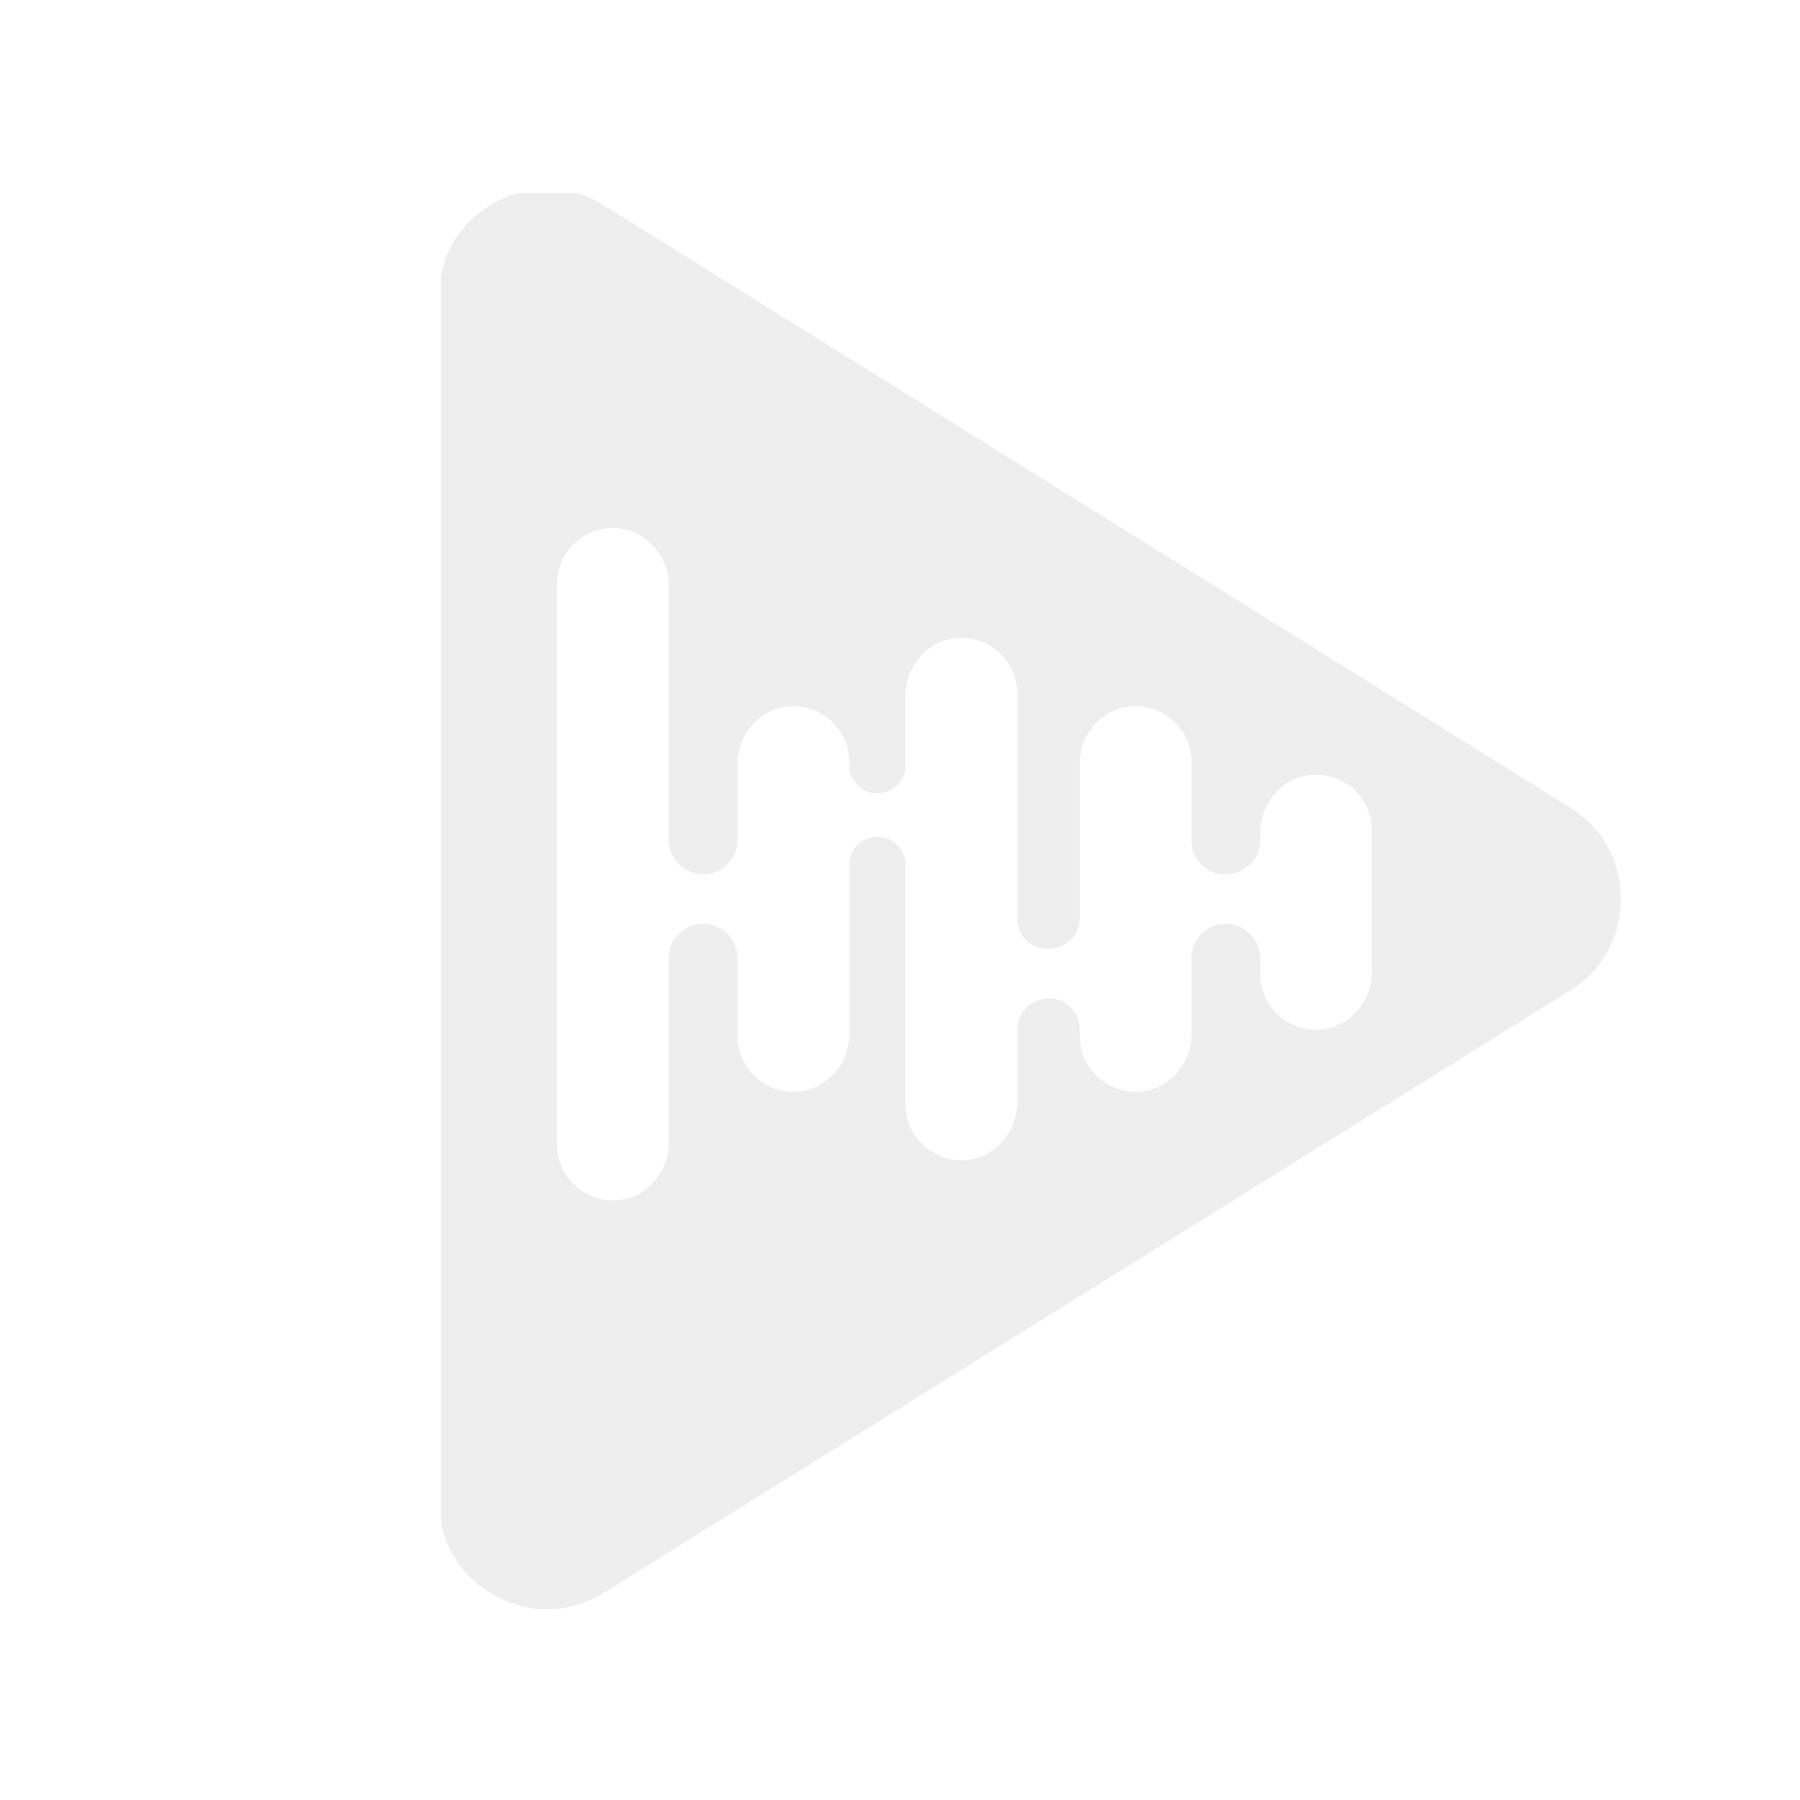 Audison APBMW-E82-E87-HIFI